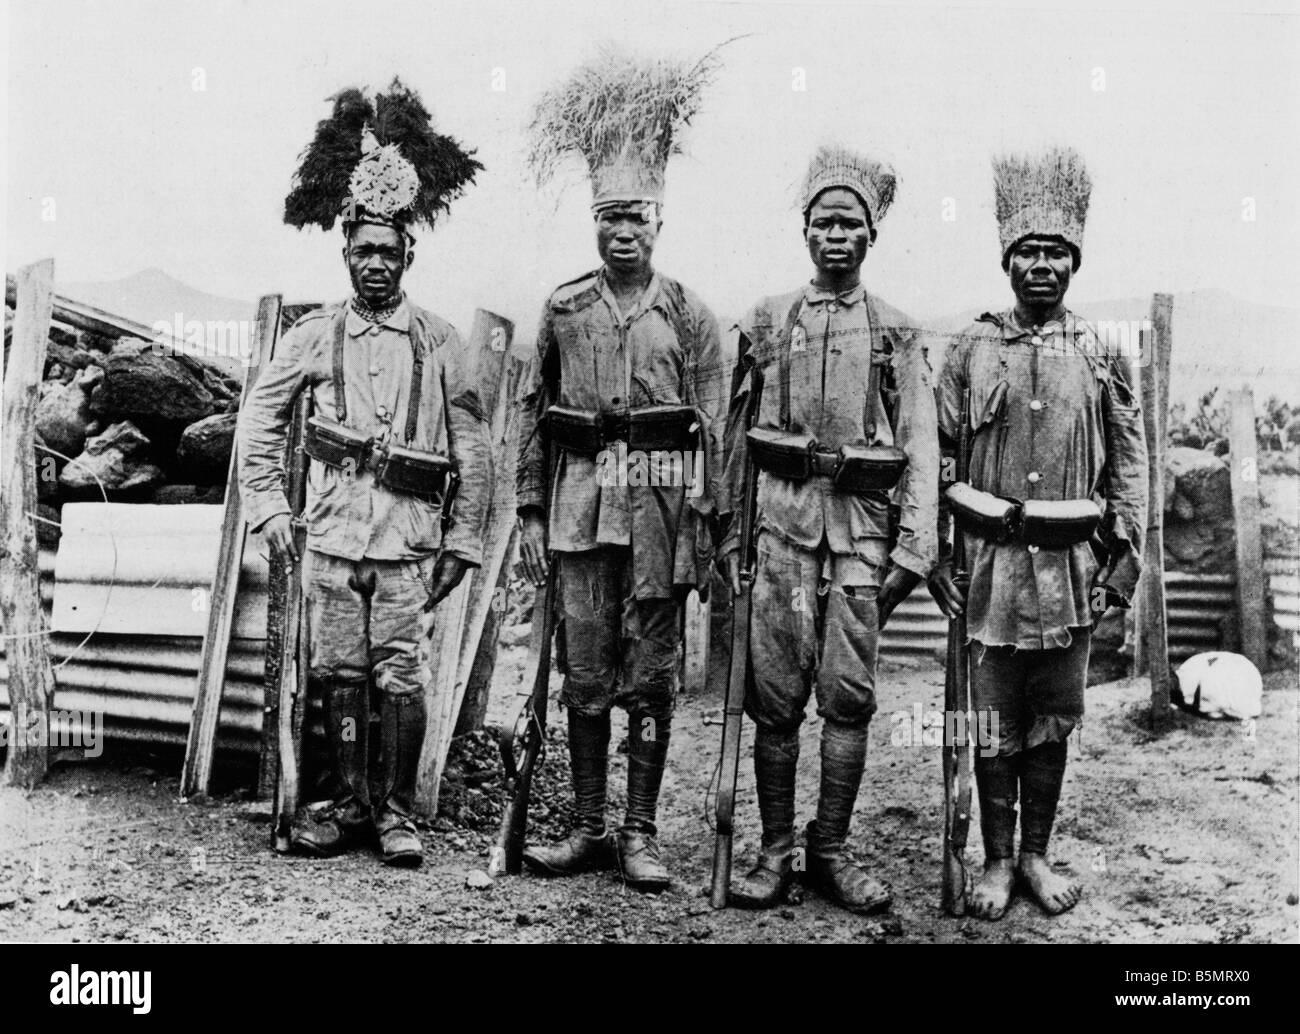 9AF 1915 7 15 A1 Askari patrol reports back World War 1 War in the colonies German East Africa now Tanzania An Askari patrol rep Stock Photo